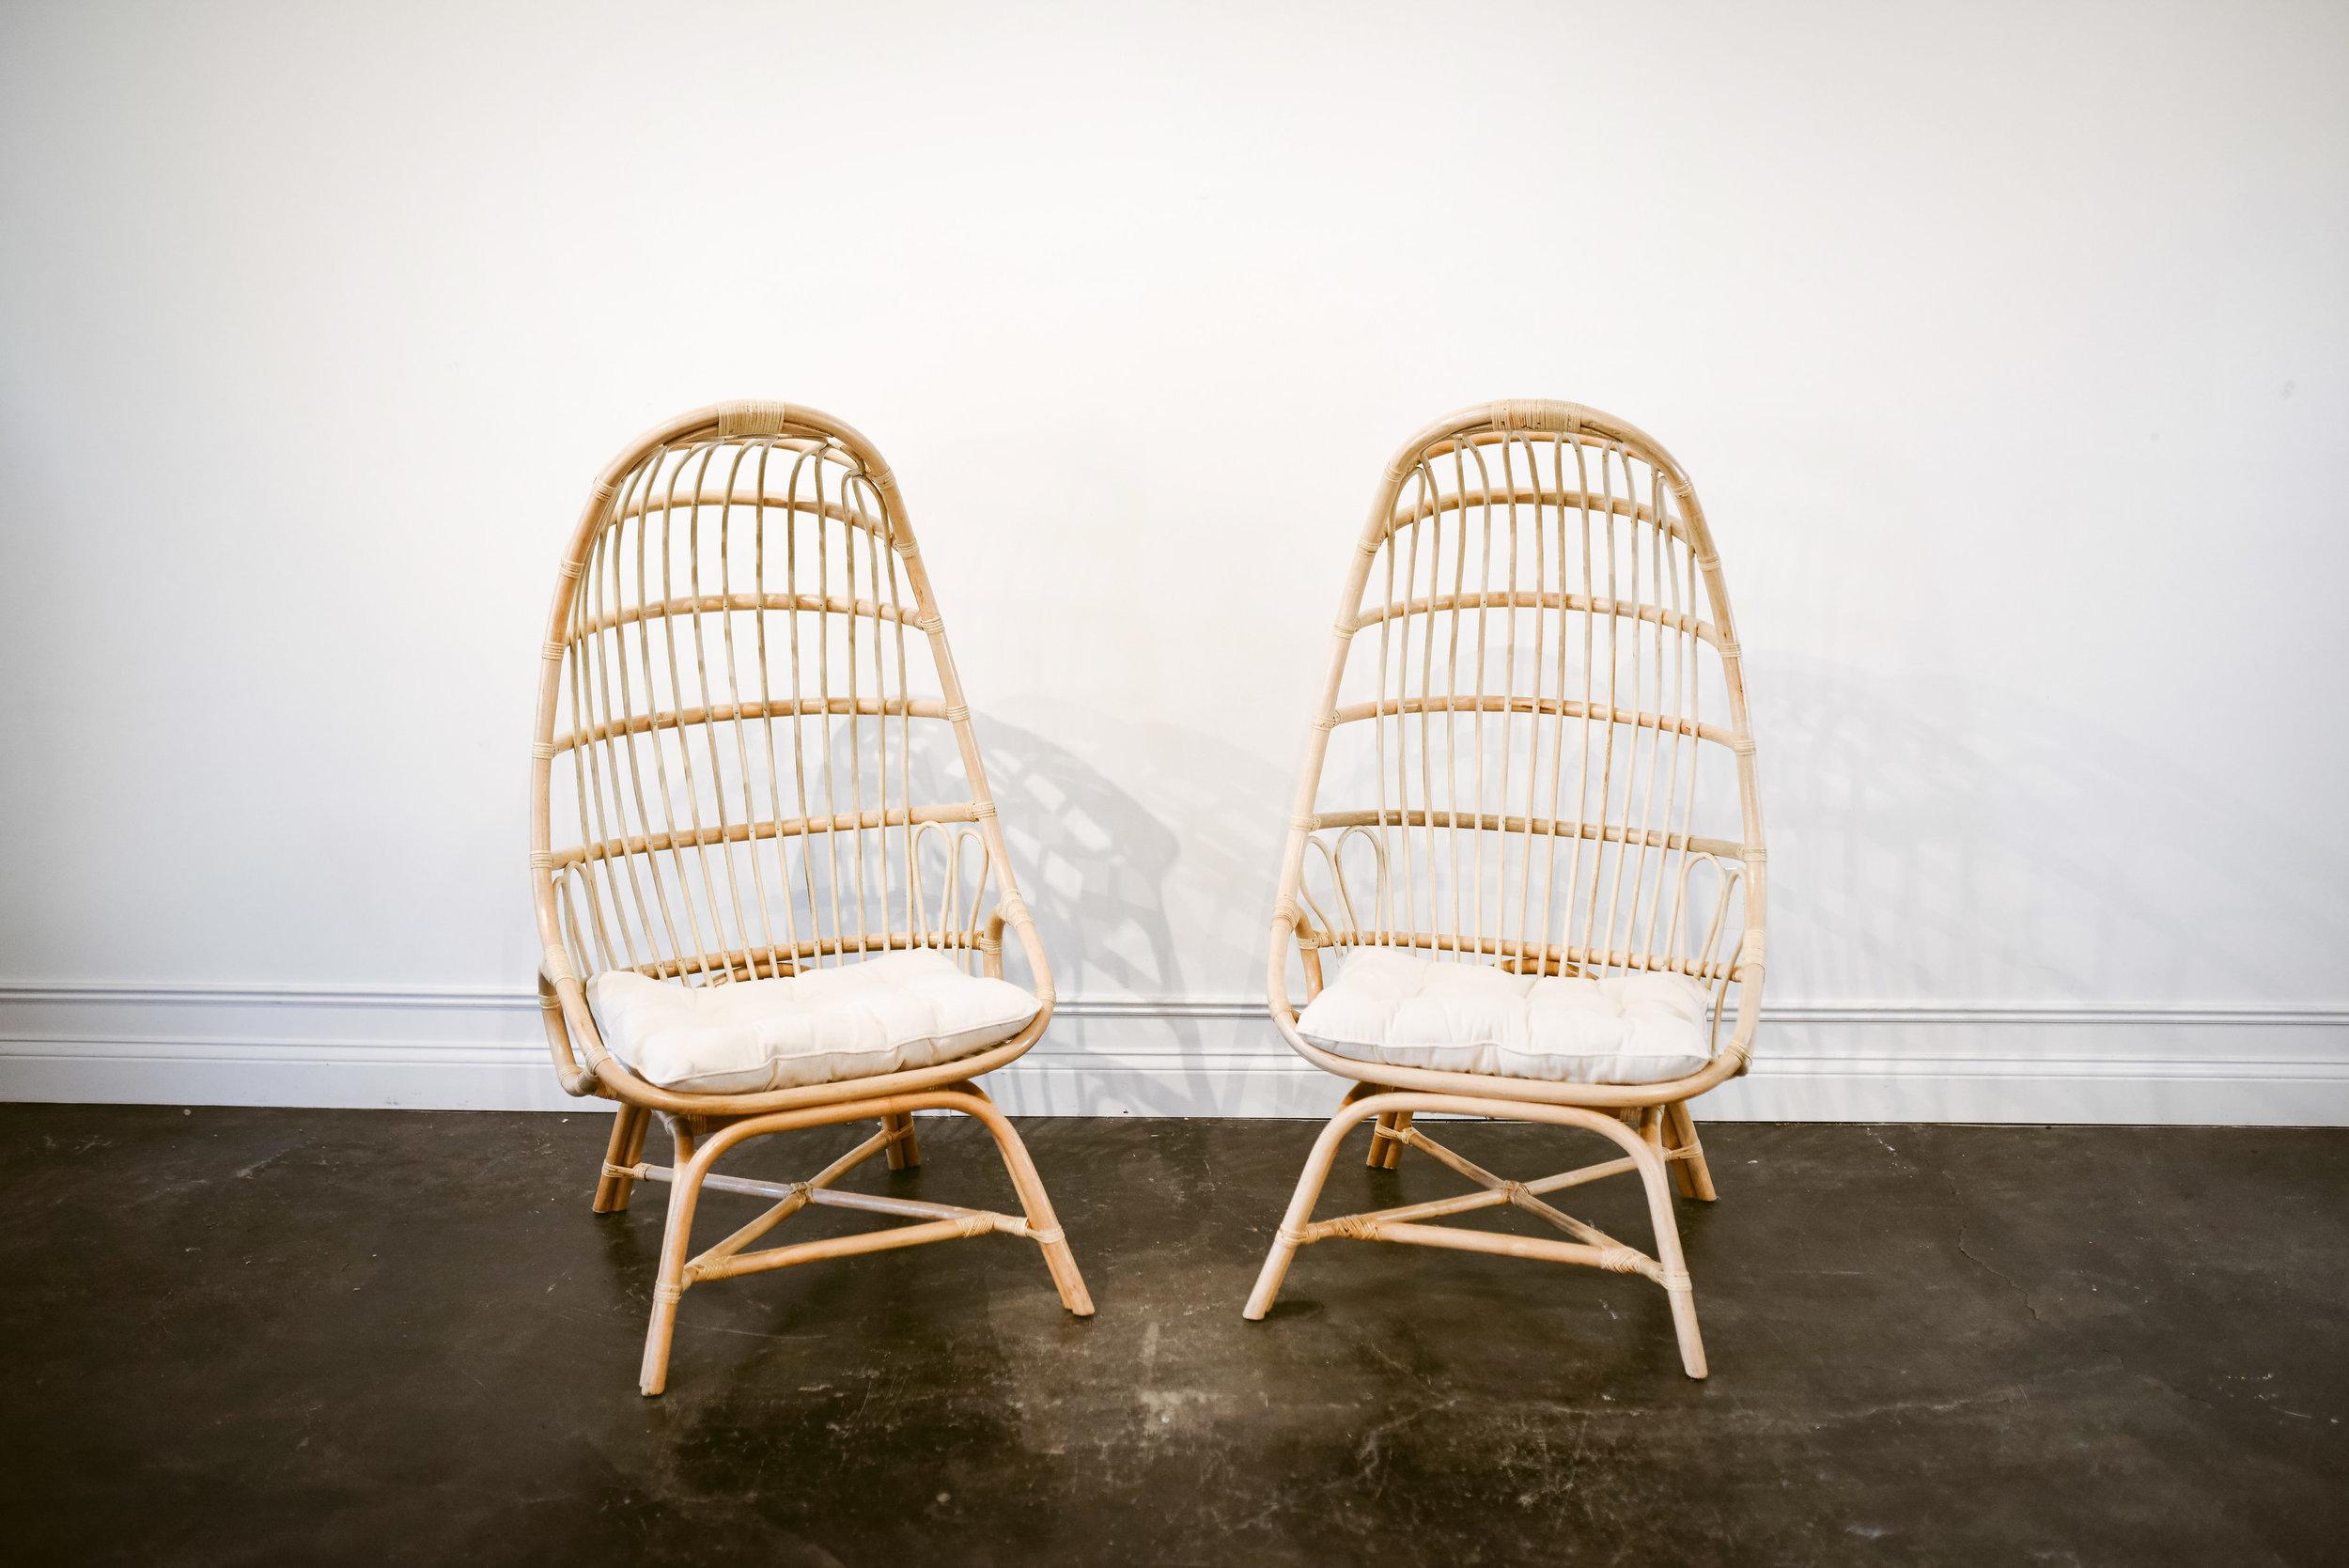 Birdie canopy chair